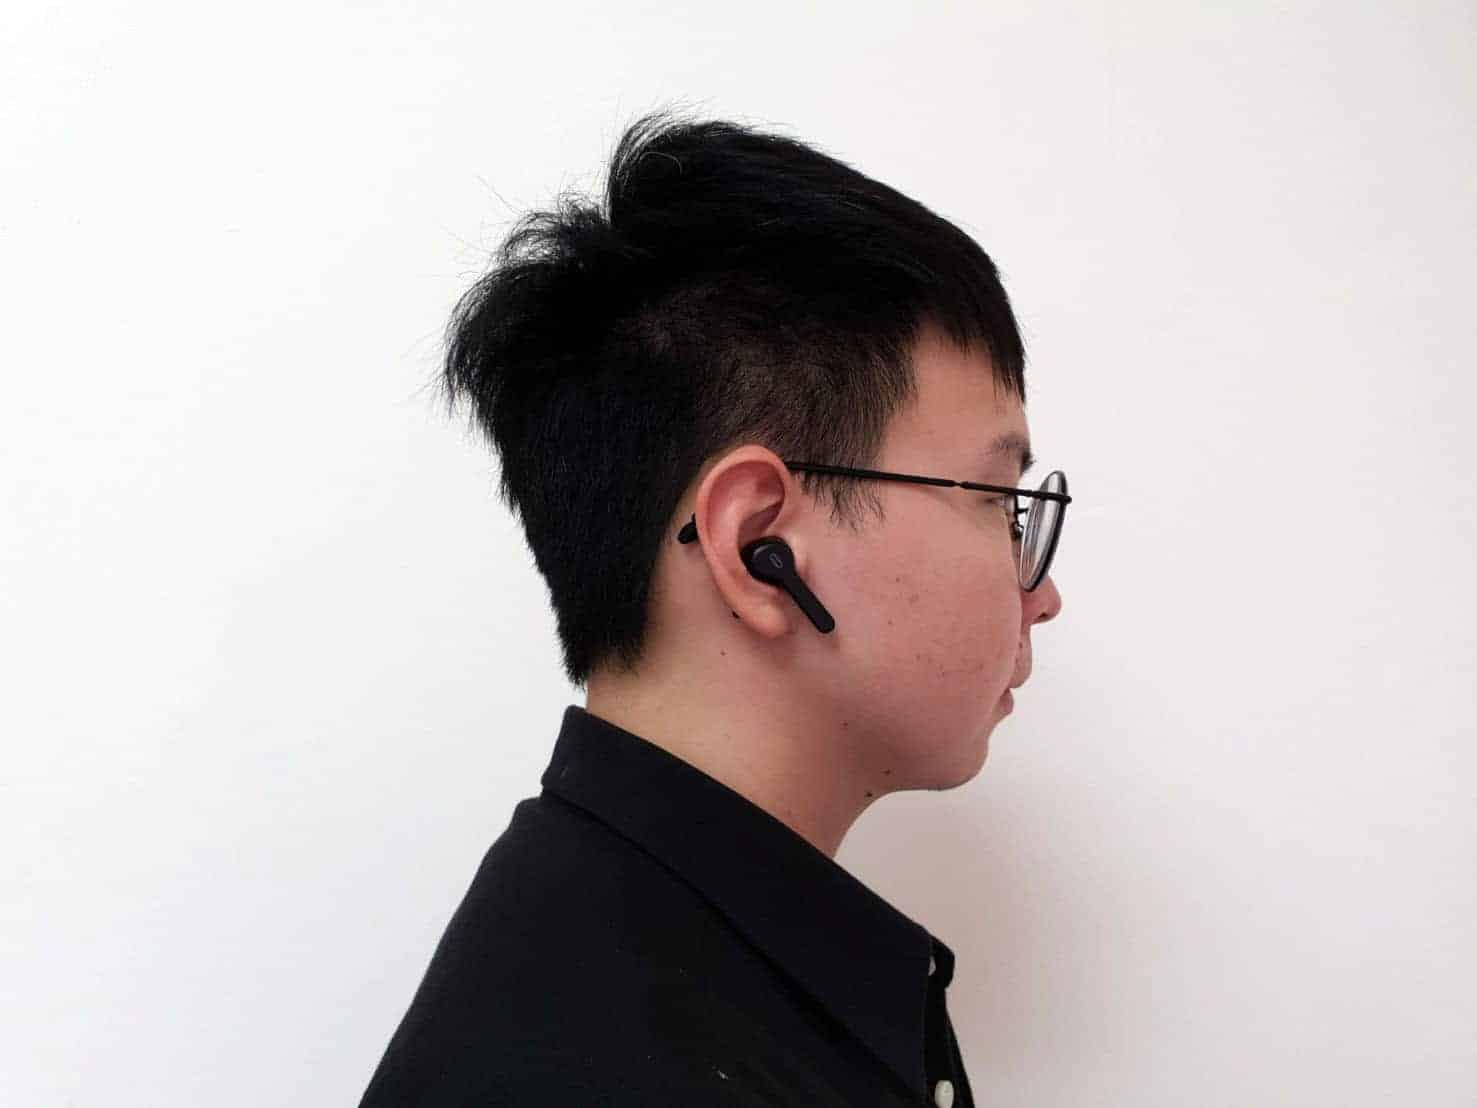 TaoTronics TT-BH053真無線藍牙耳機推薦 配戴感受